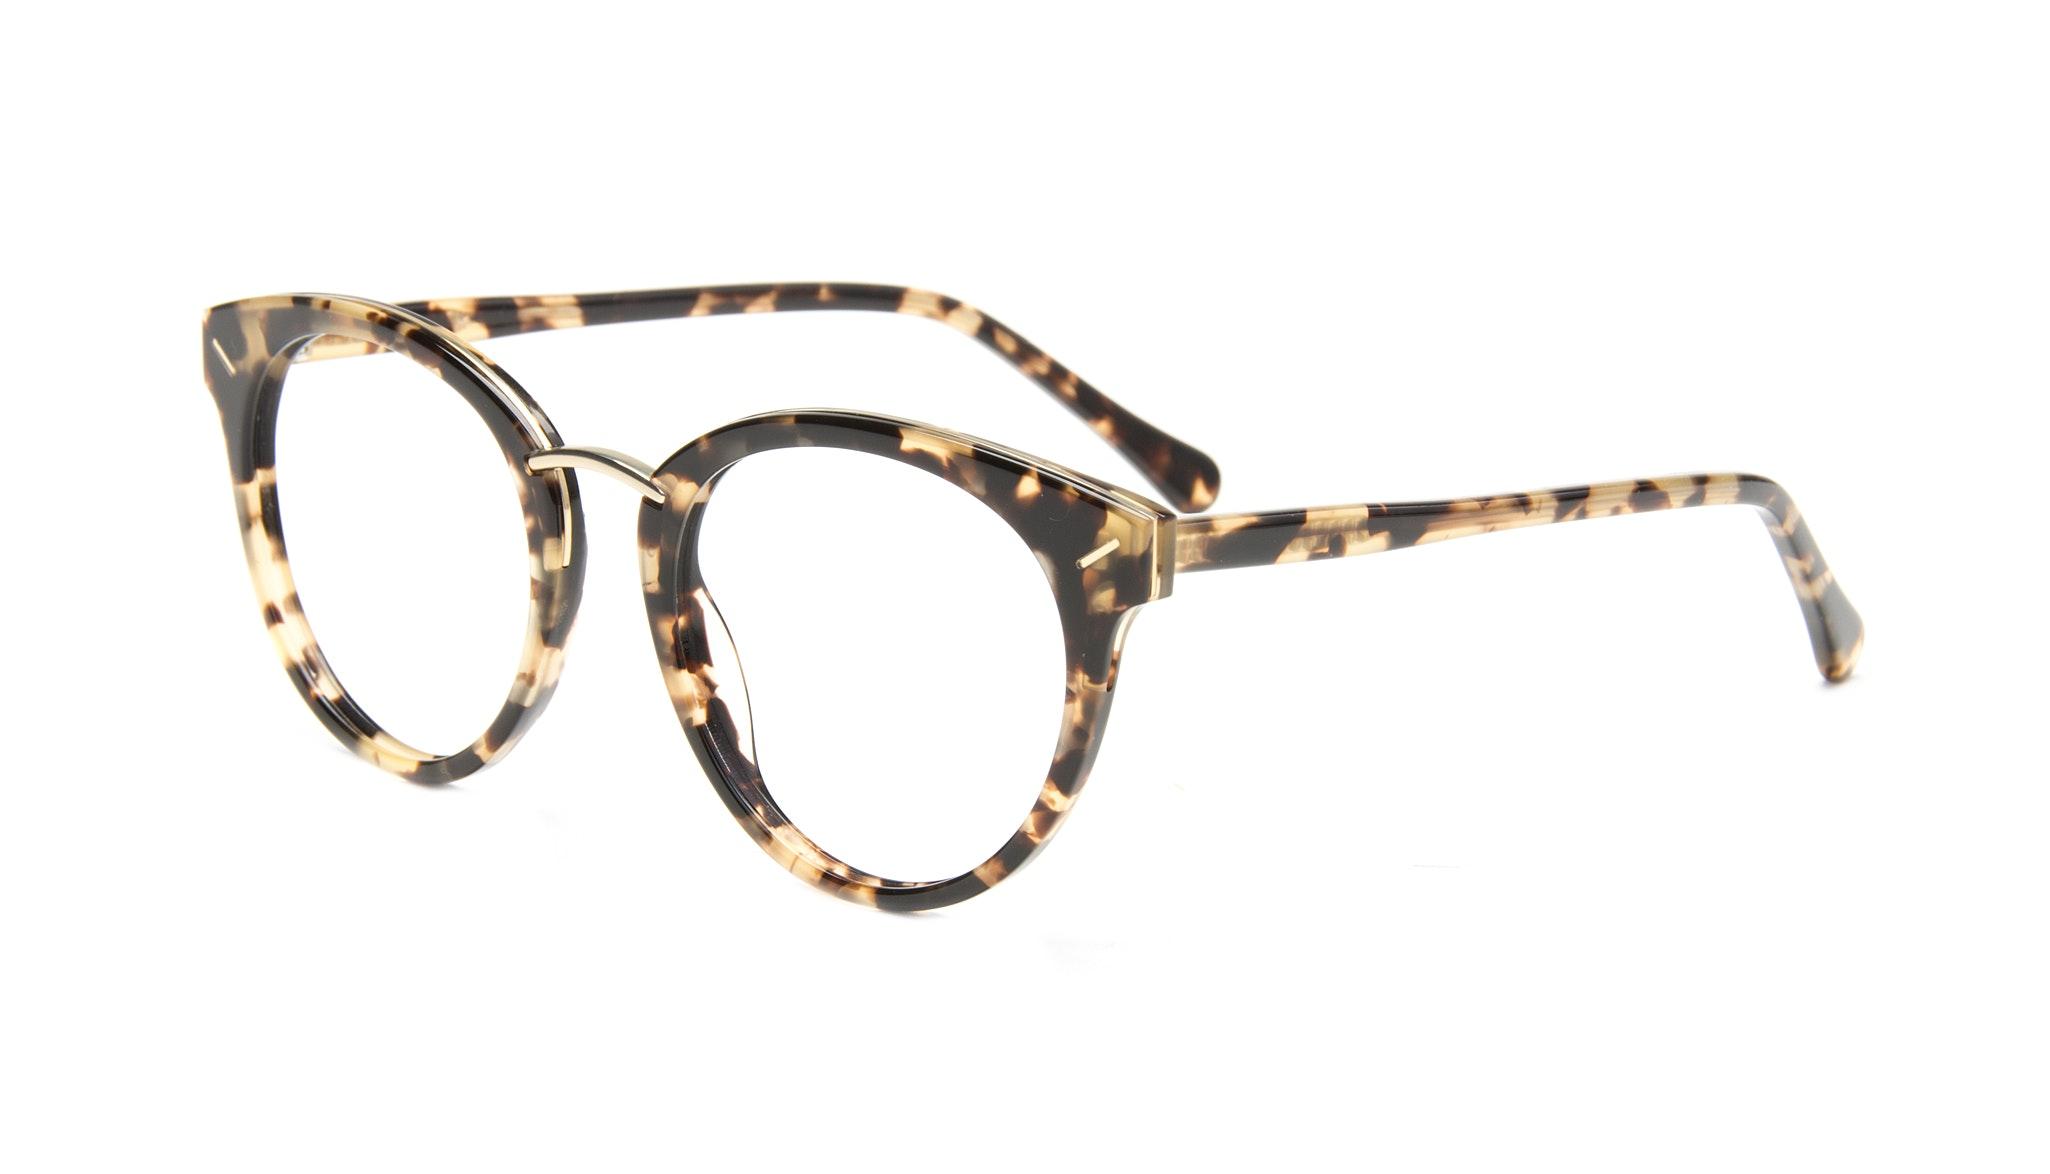 Affordable Fashion Glasses Cat Eye Round Eyeglasses Women Element Gold Tort Tilt